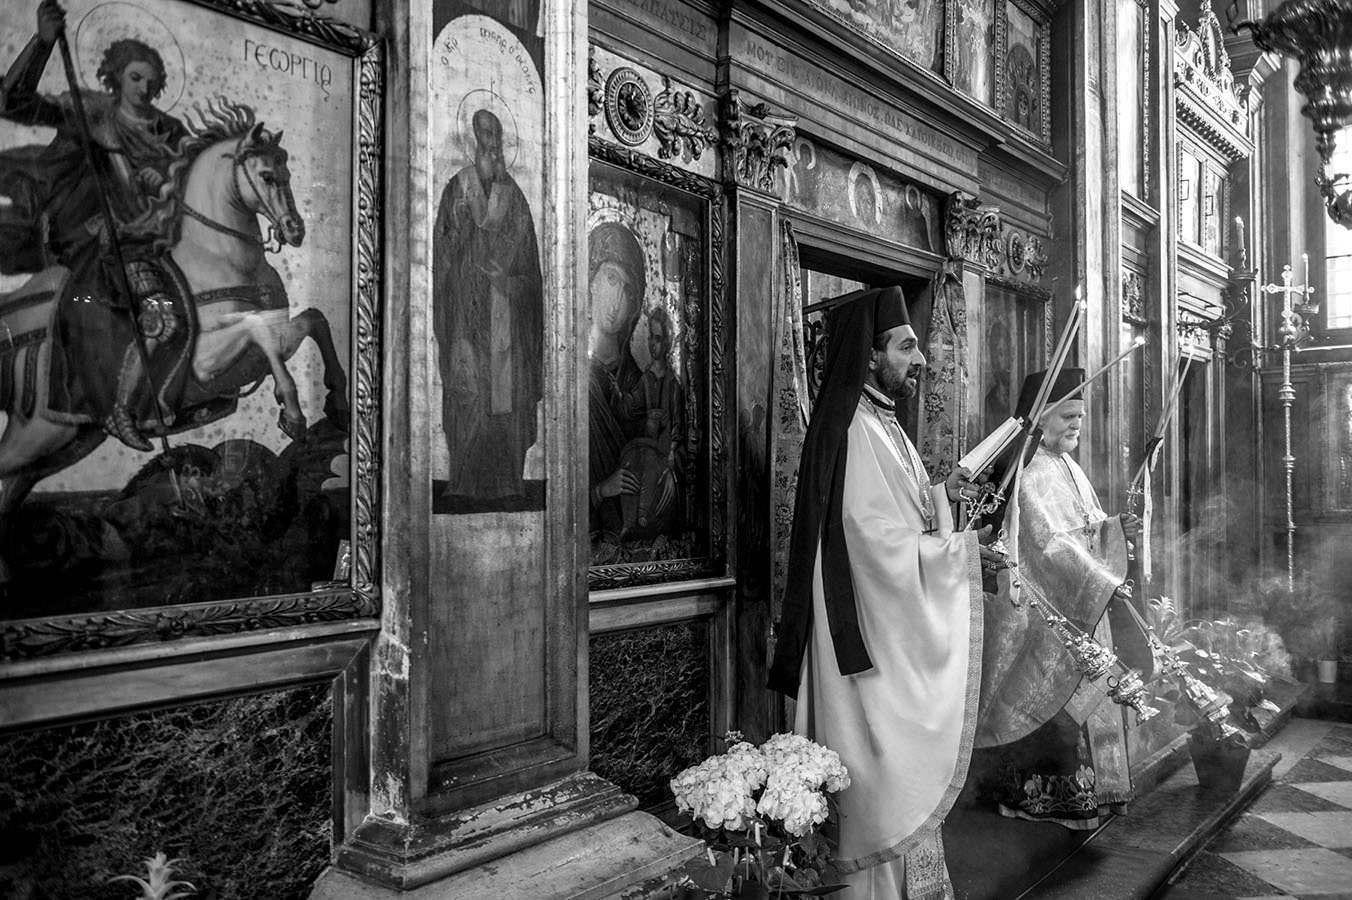 Celebrations for the feast of San Giorgio